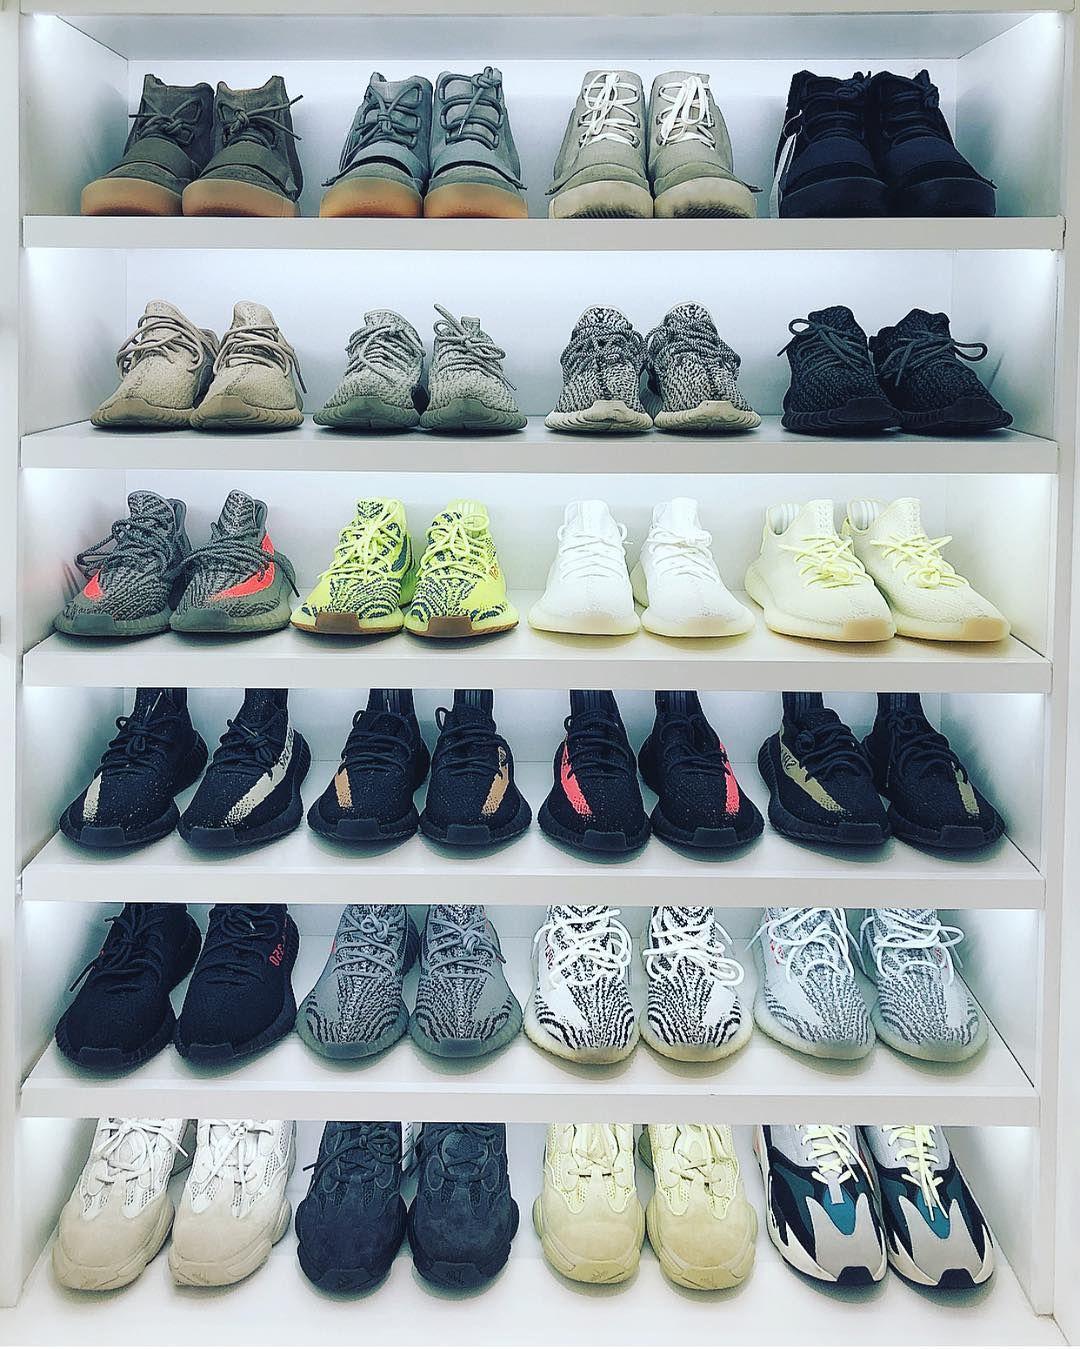 adidas yeezy kollektion